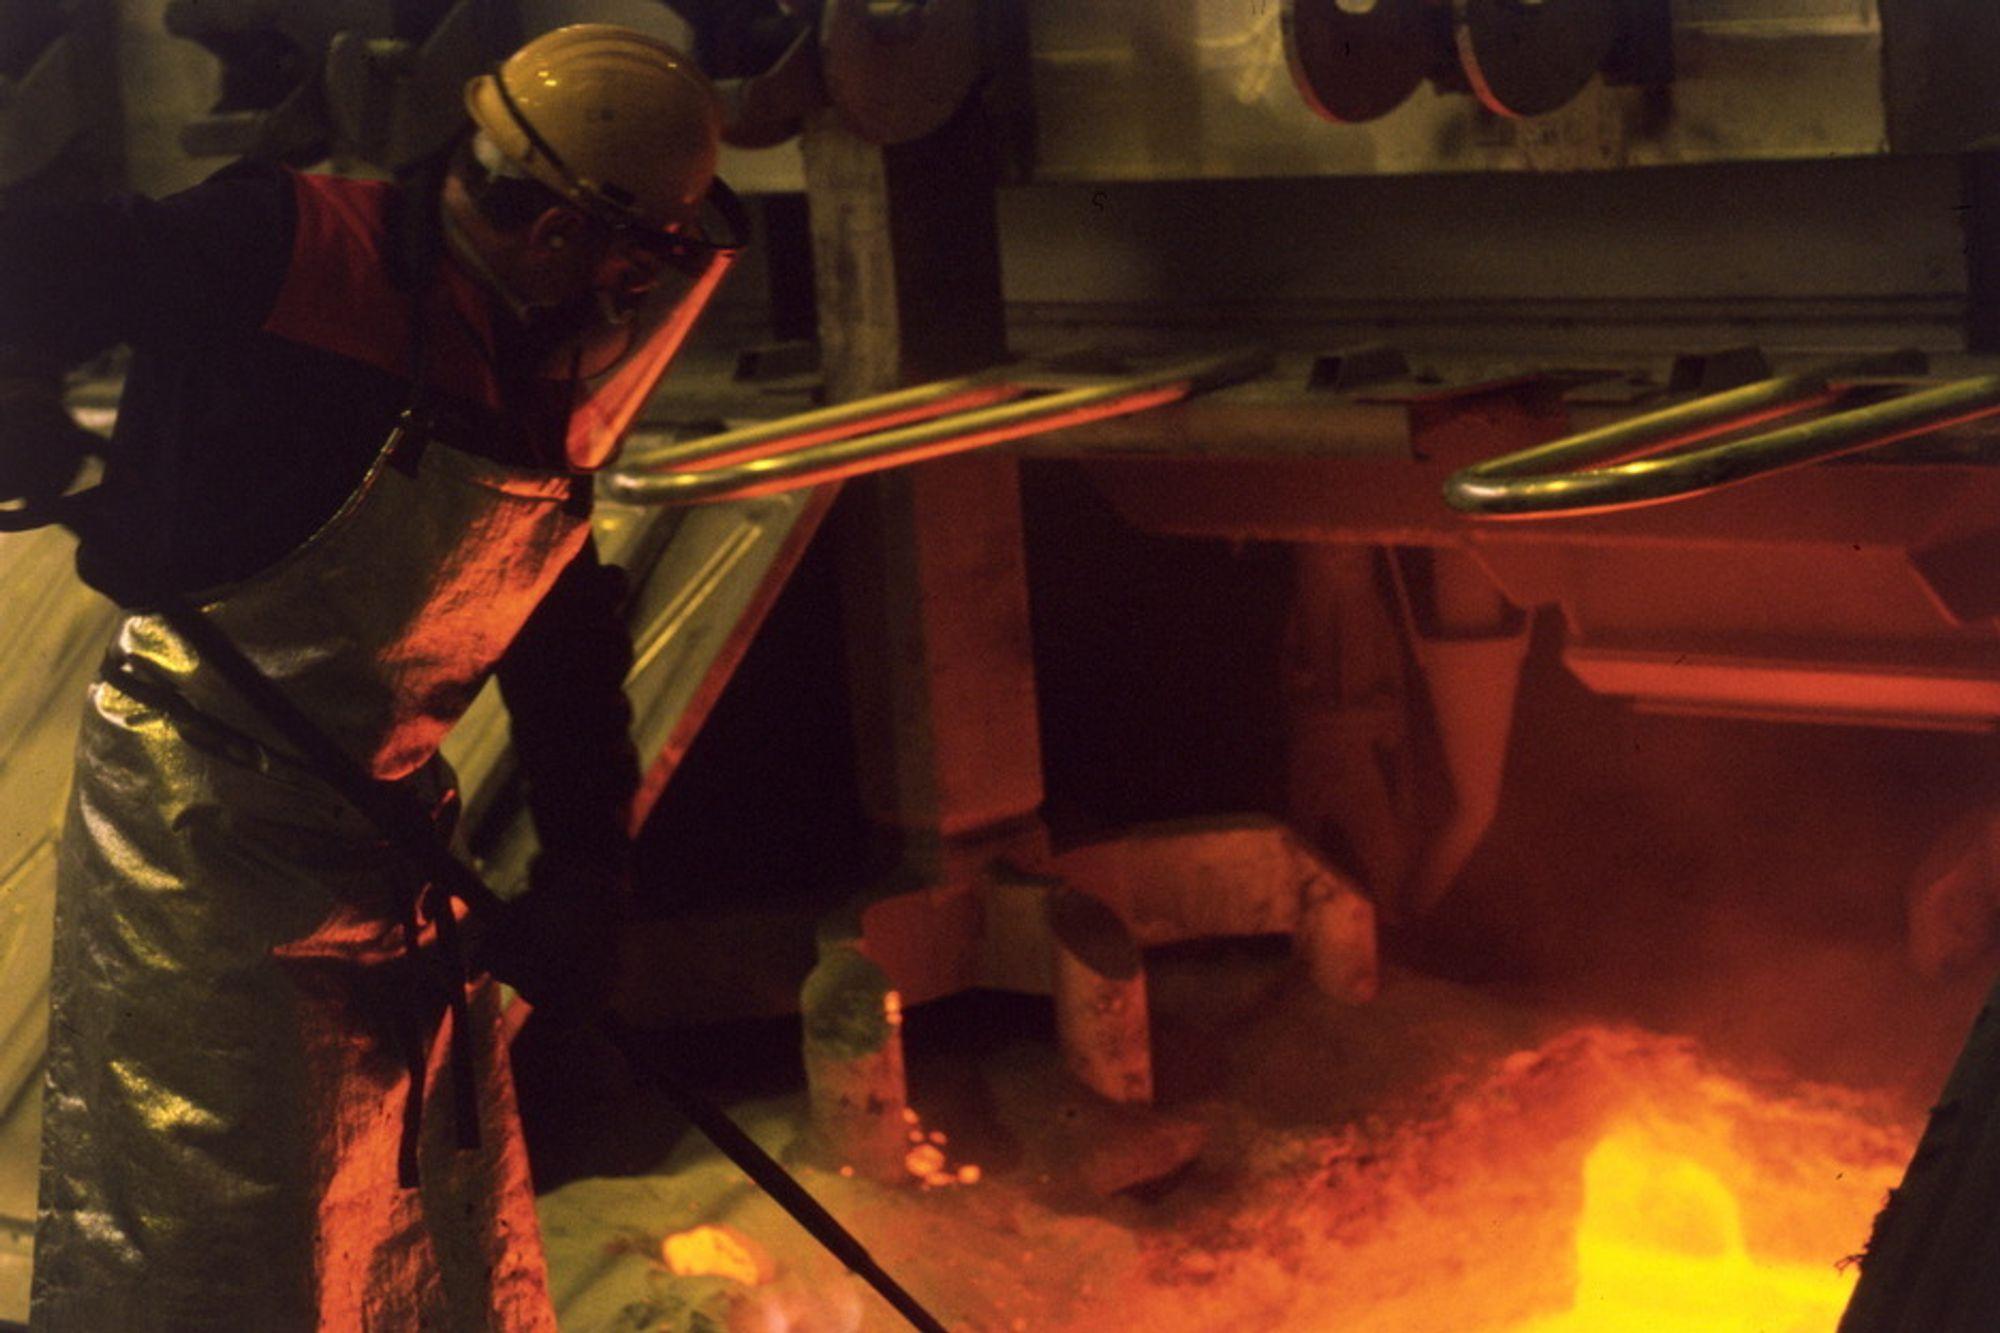 Arbeider i aluminiumsindustrien utsettes for farlige stoffer.